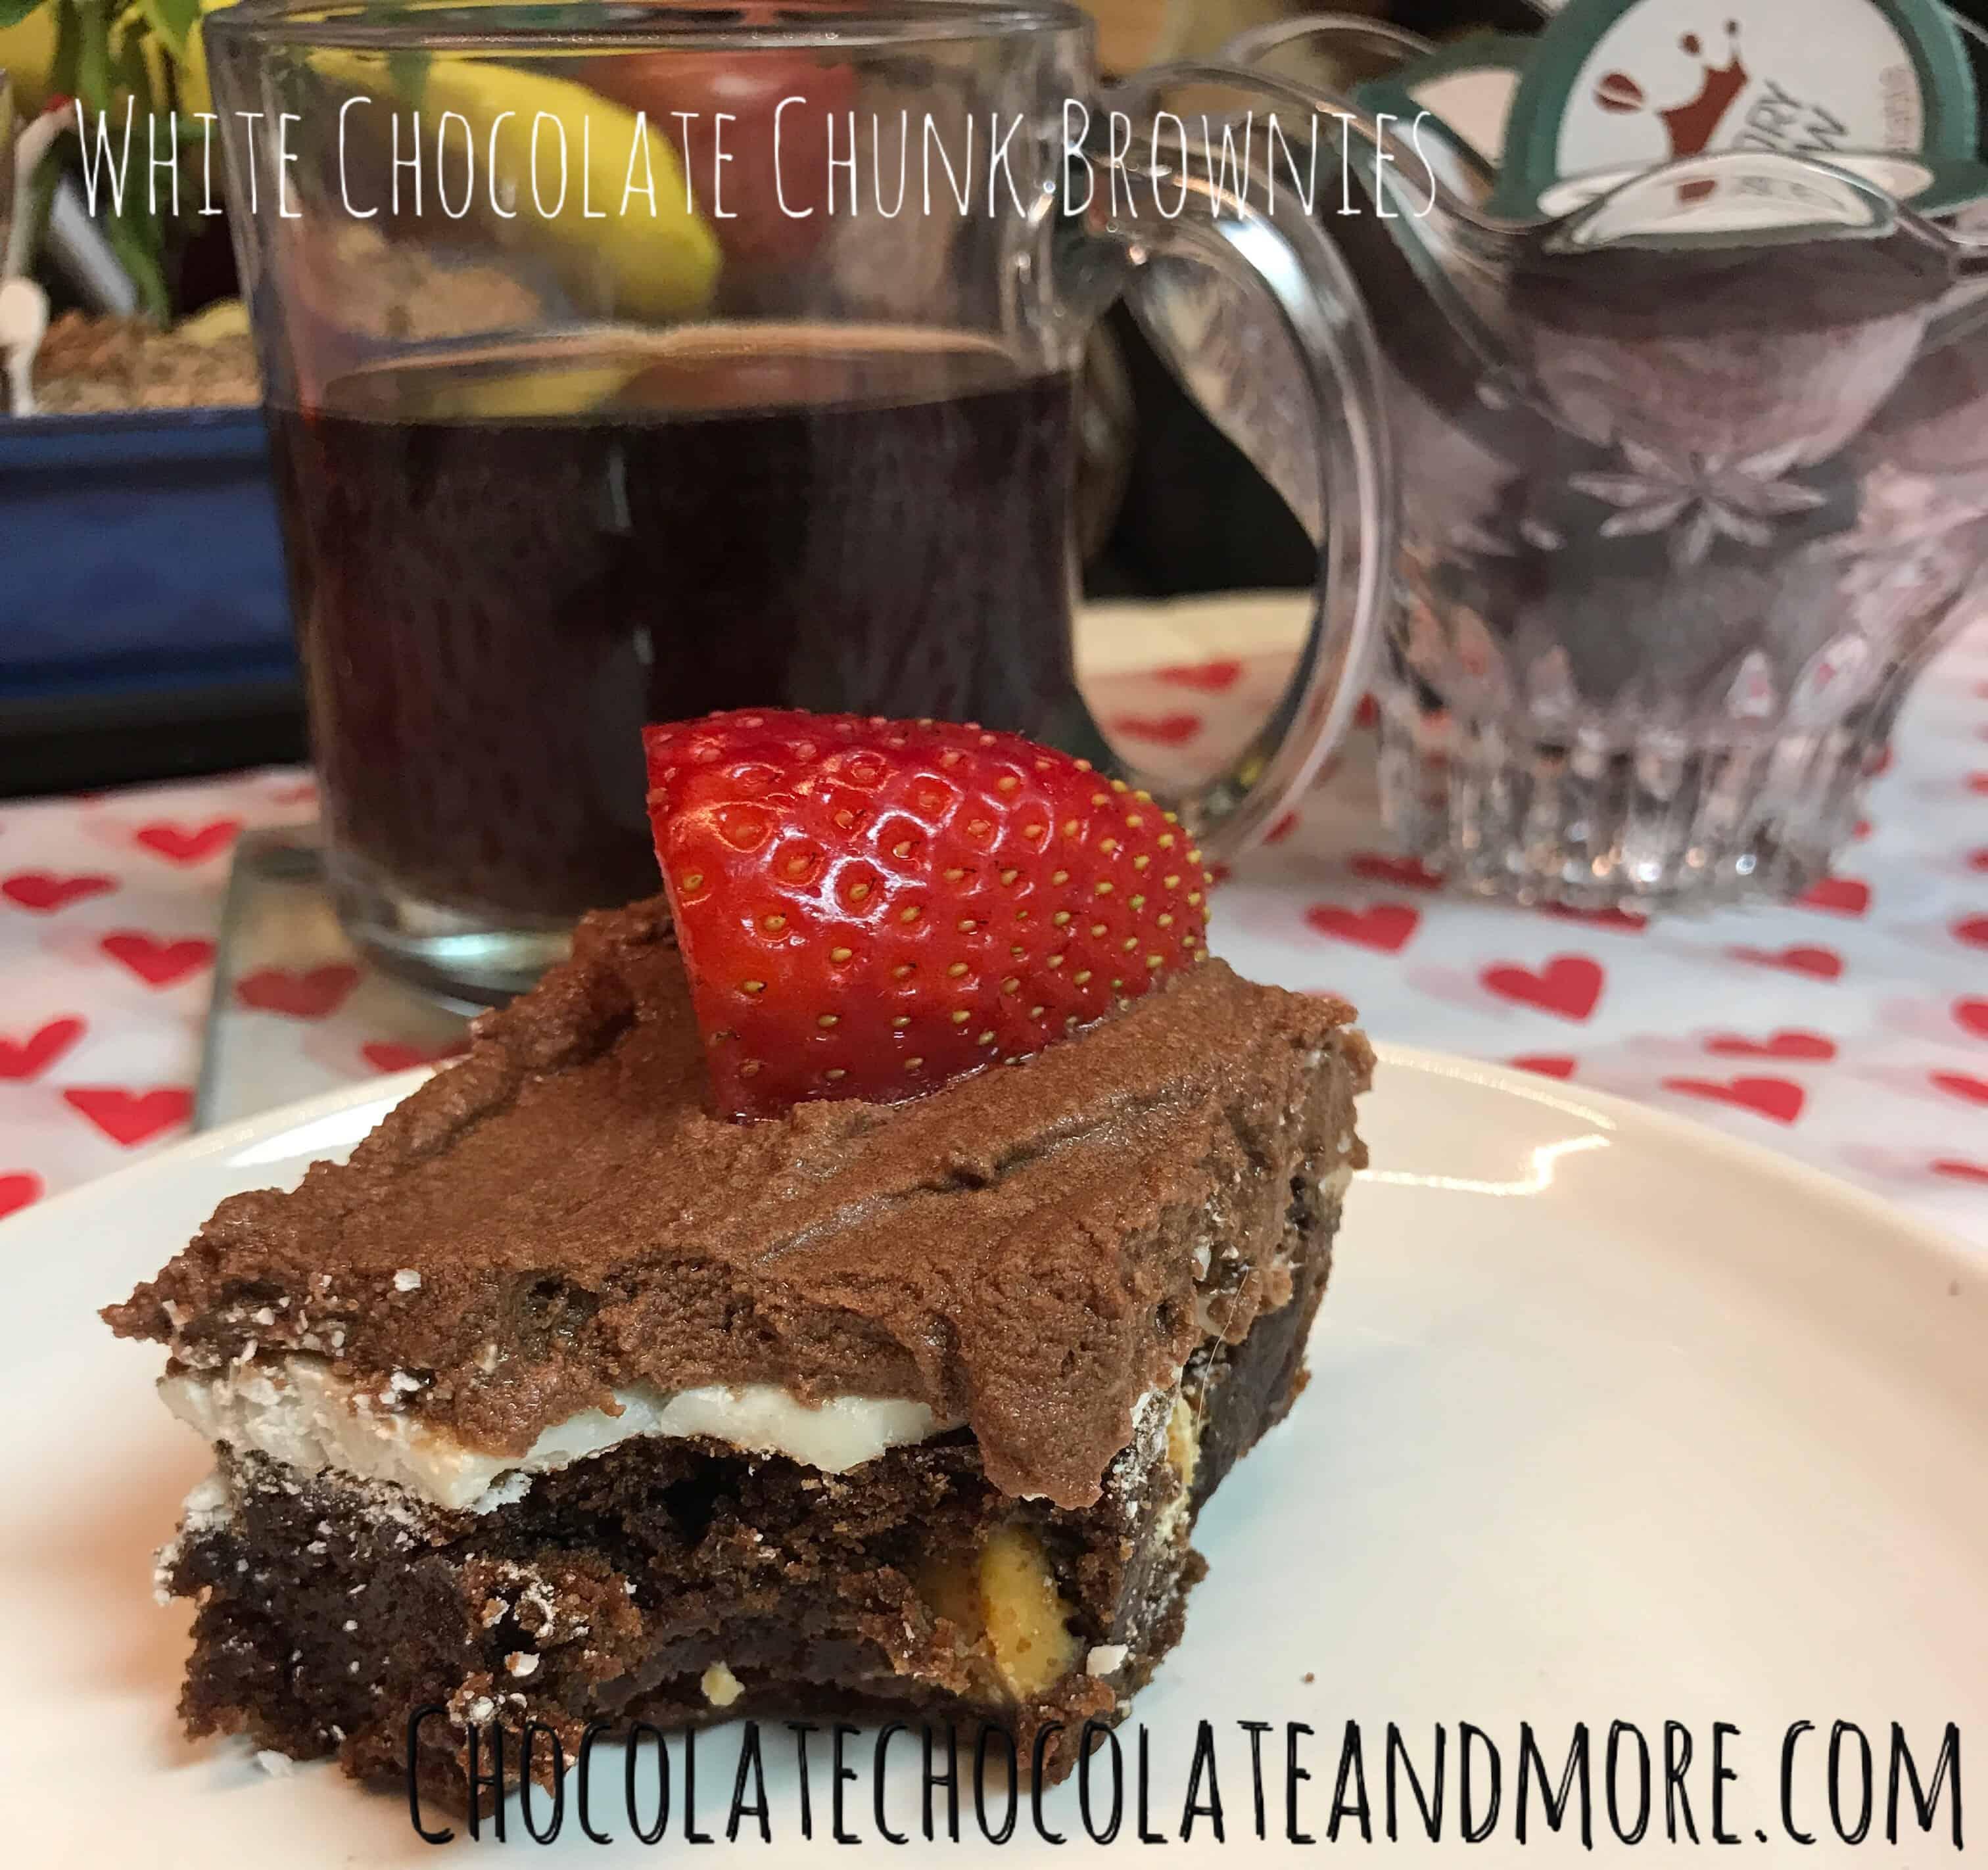 White Chocolate Chunk Brownies with Mocha Icing